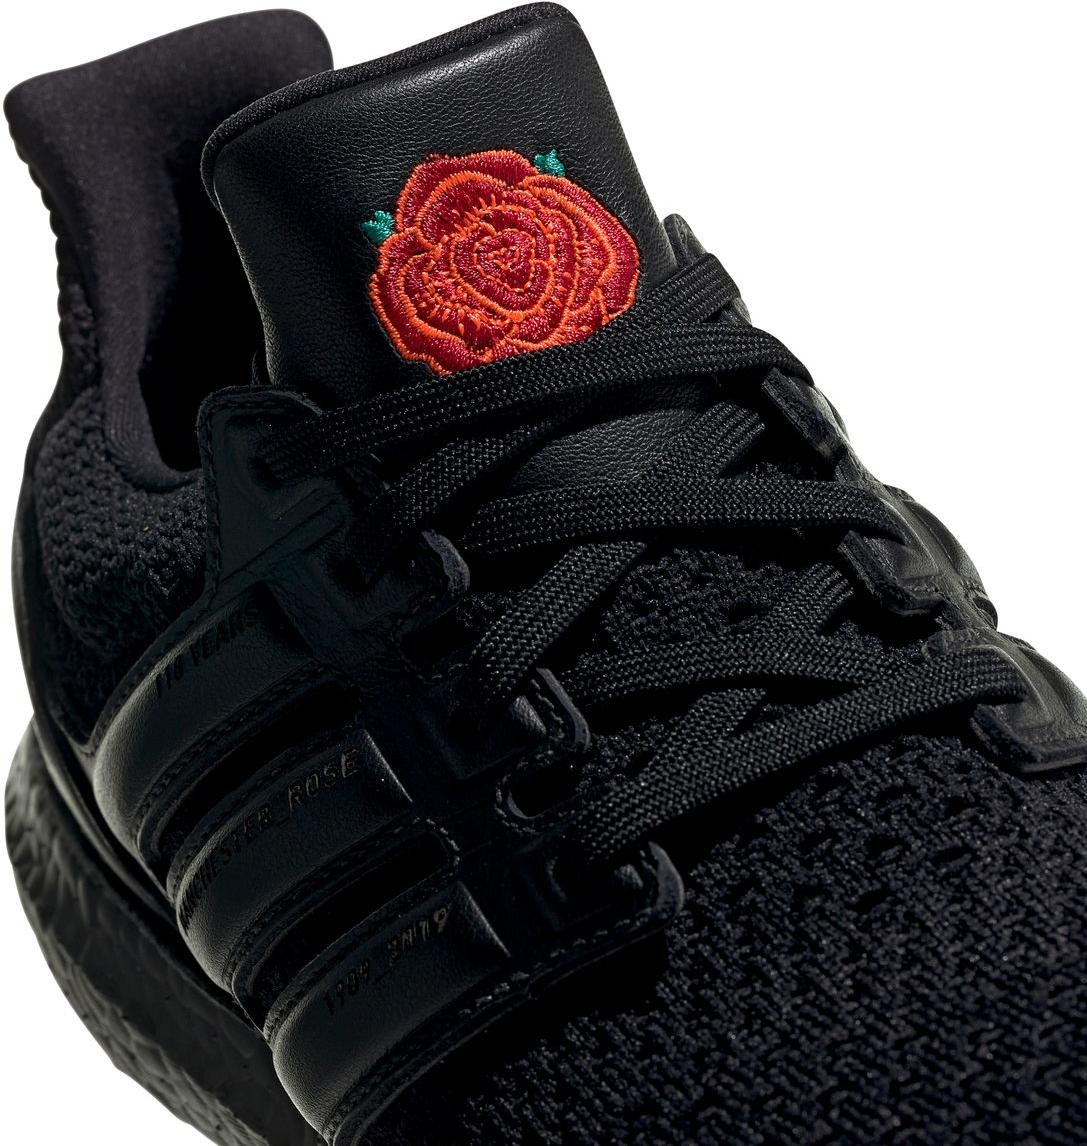 Running Shoes Adidas Ultraboost X Manu Fc Top4football Com